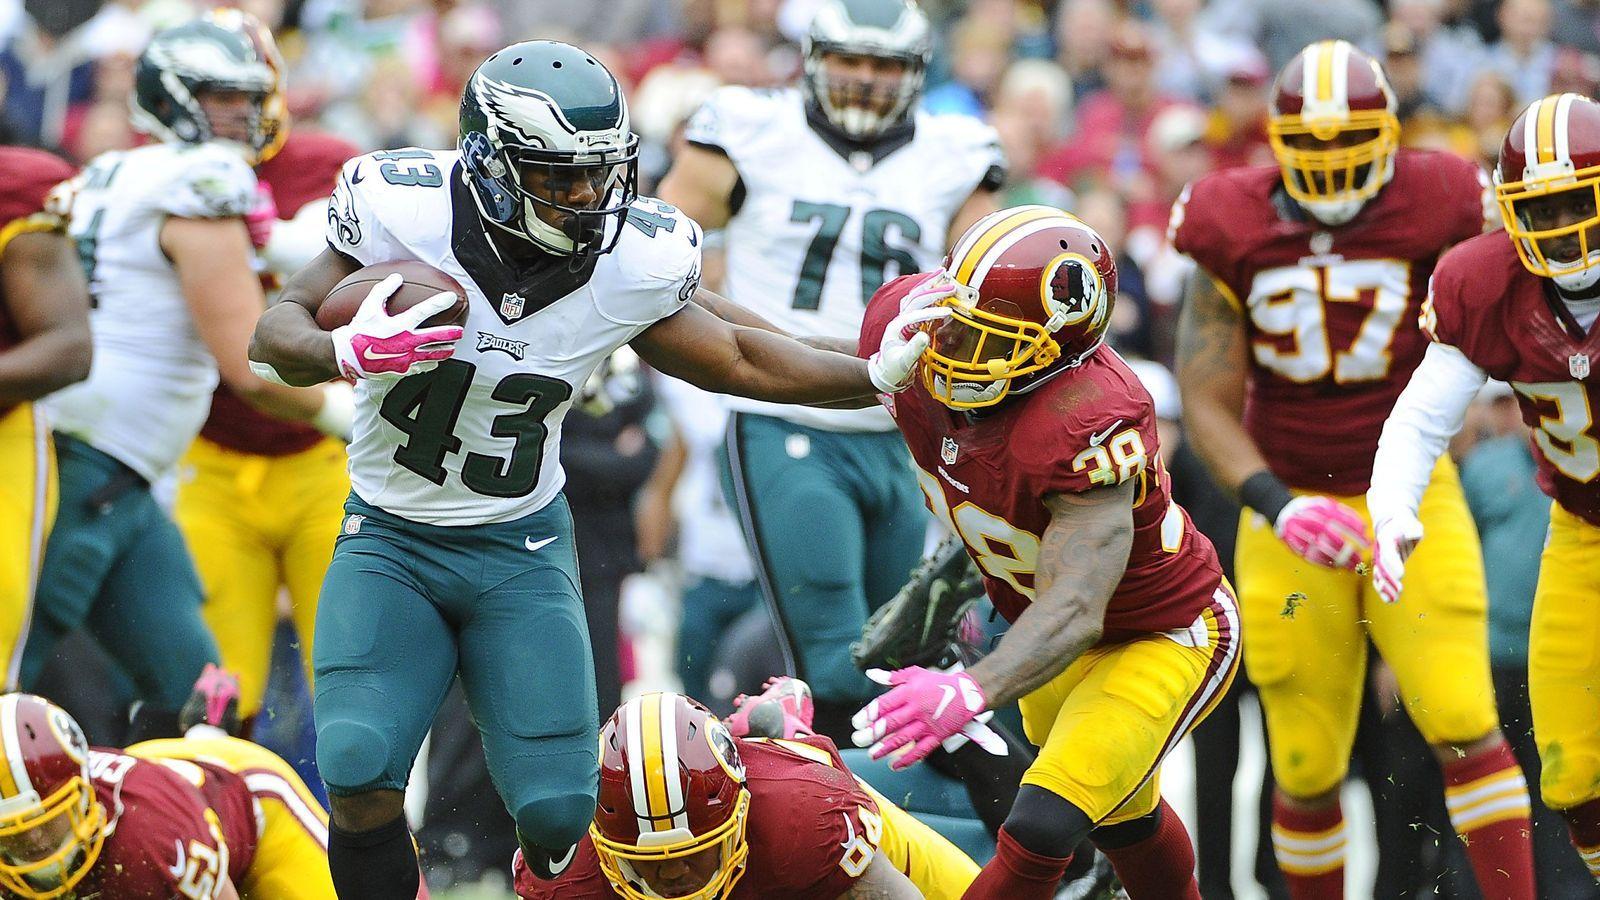 Darren Sproles Could Be Eagles X Factor Against Washington With Images Redskins Redskins Game Eagles